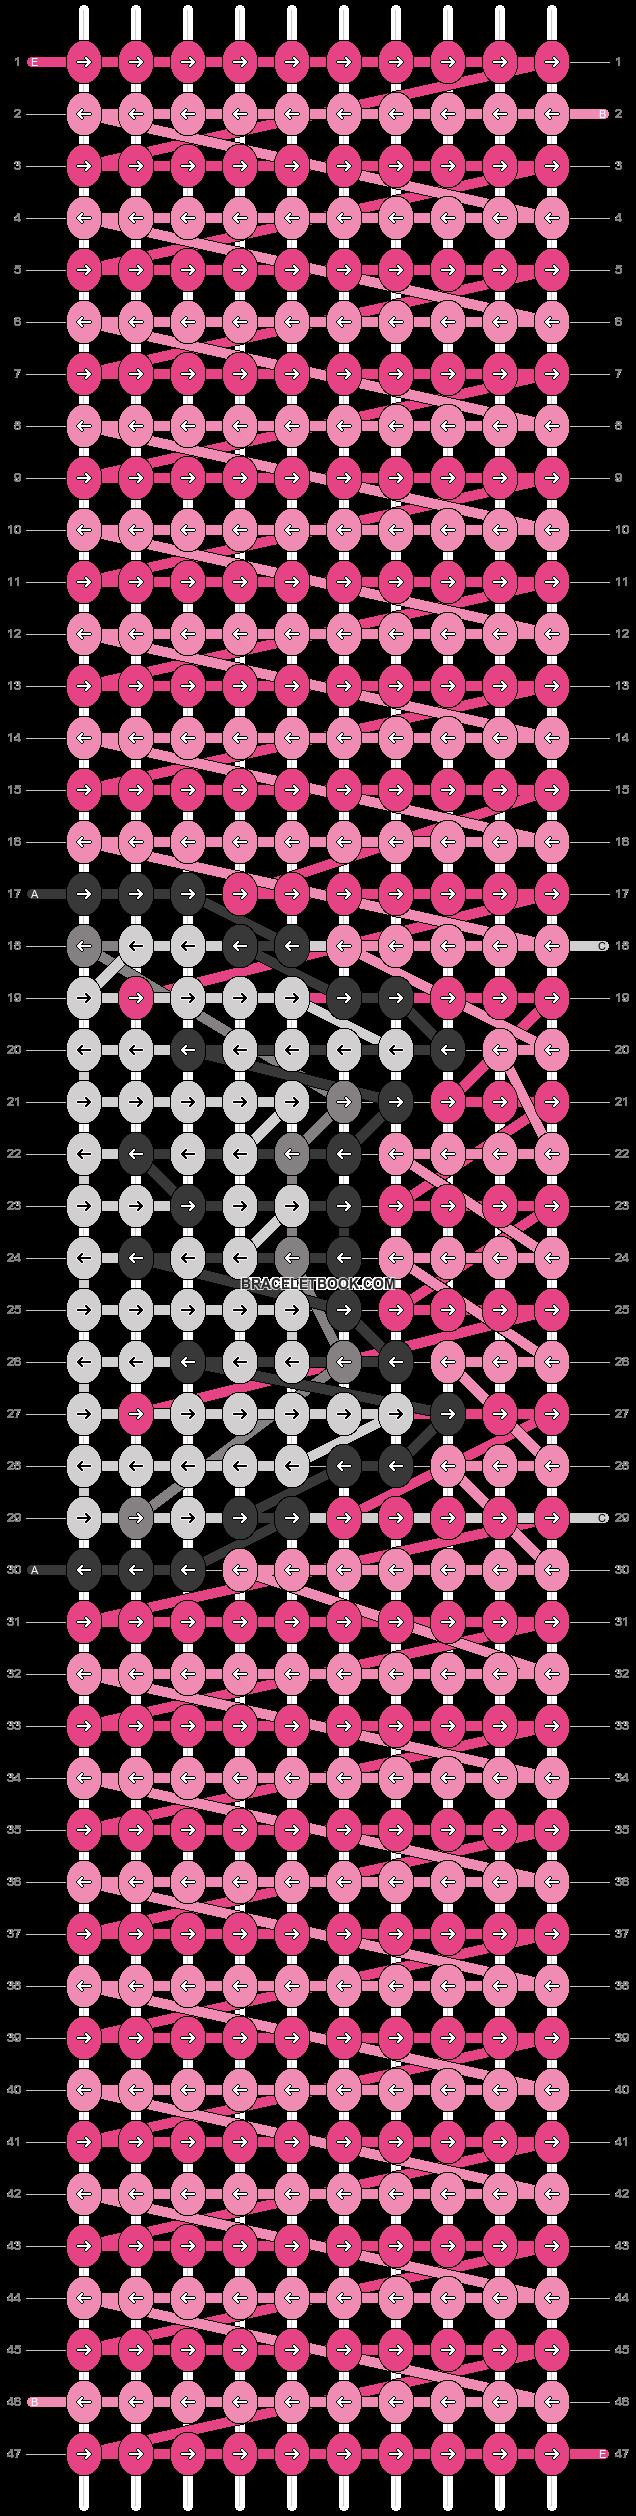 Alpha pattern #23115 pattern